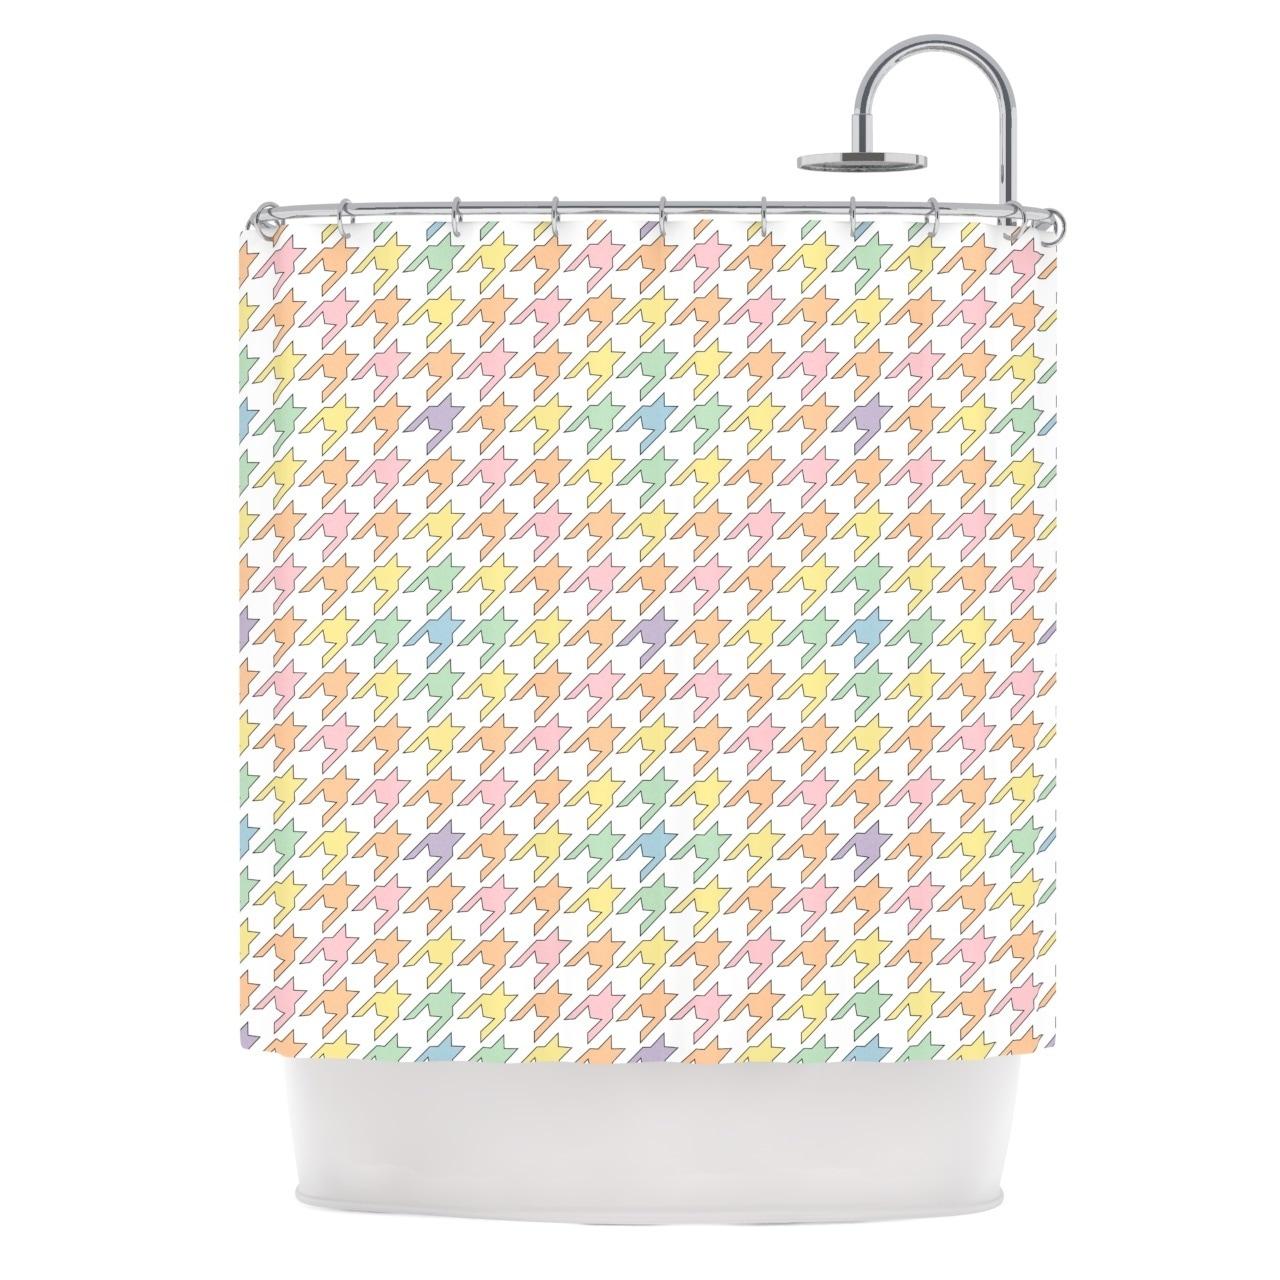 Shop KESS InHouse Empire Ruhl Pastel Houndstooth Shower Curtain 69x70